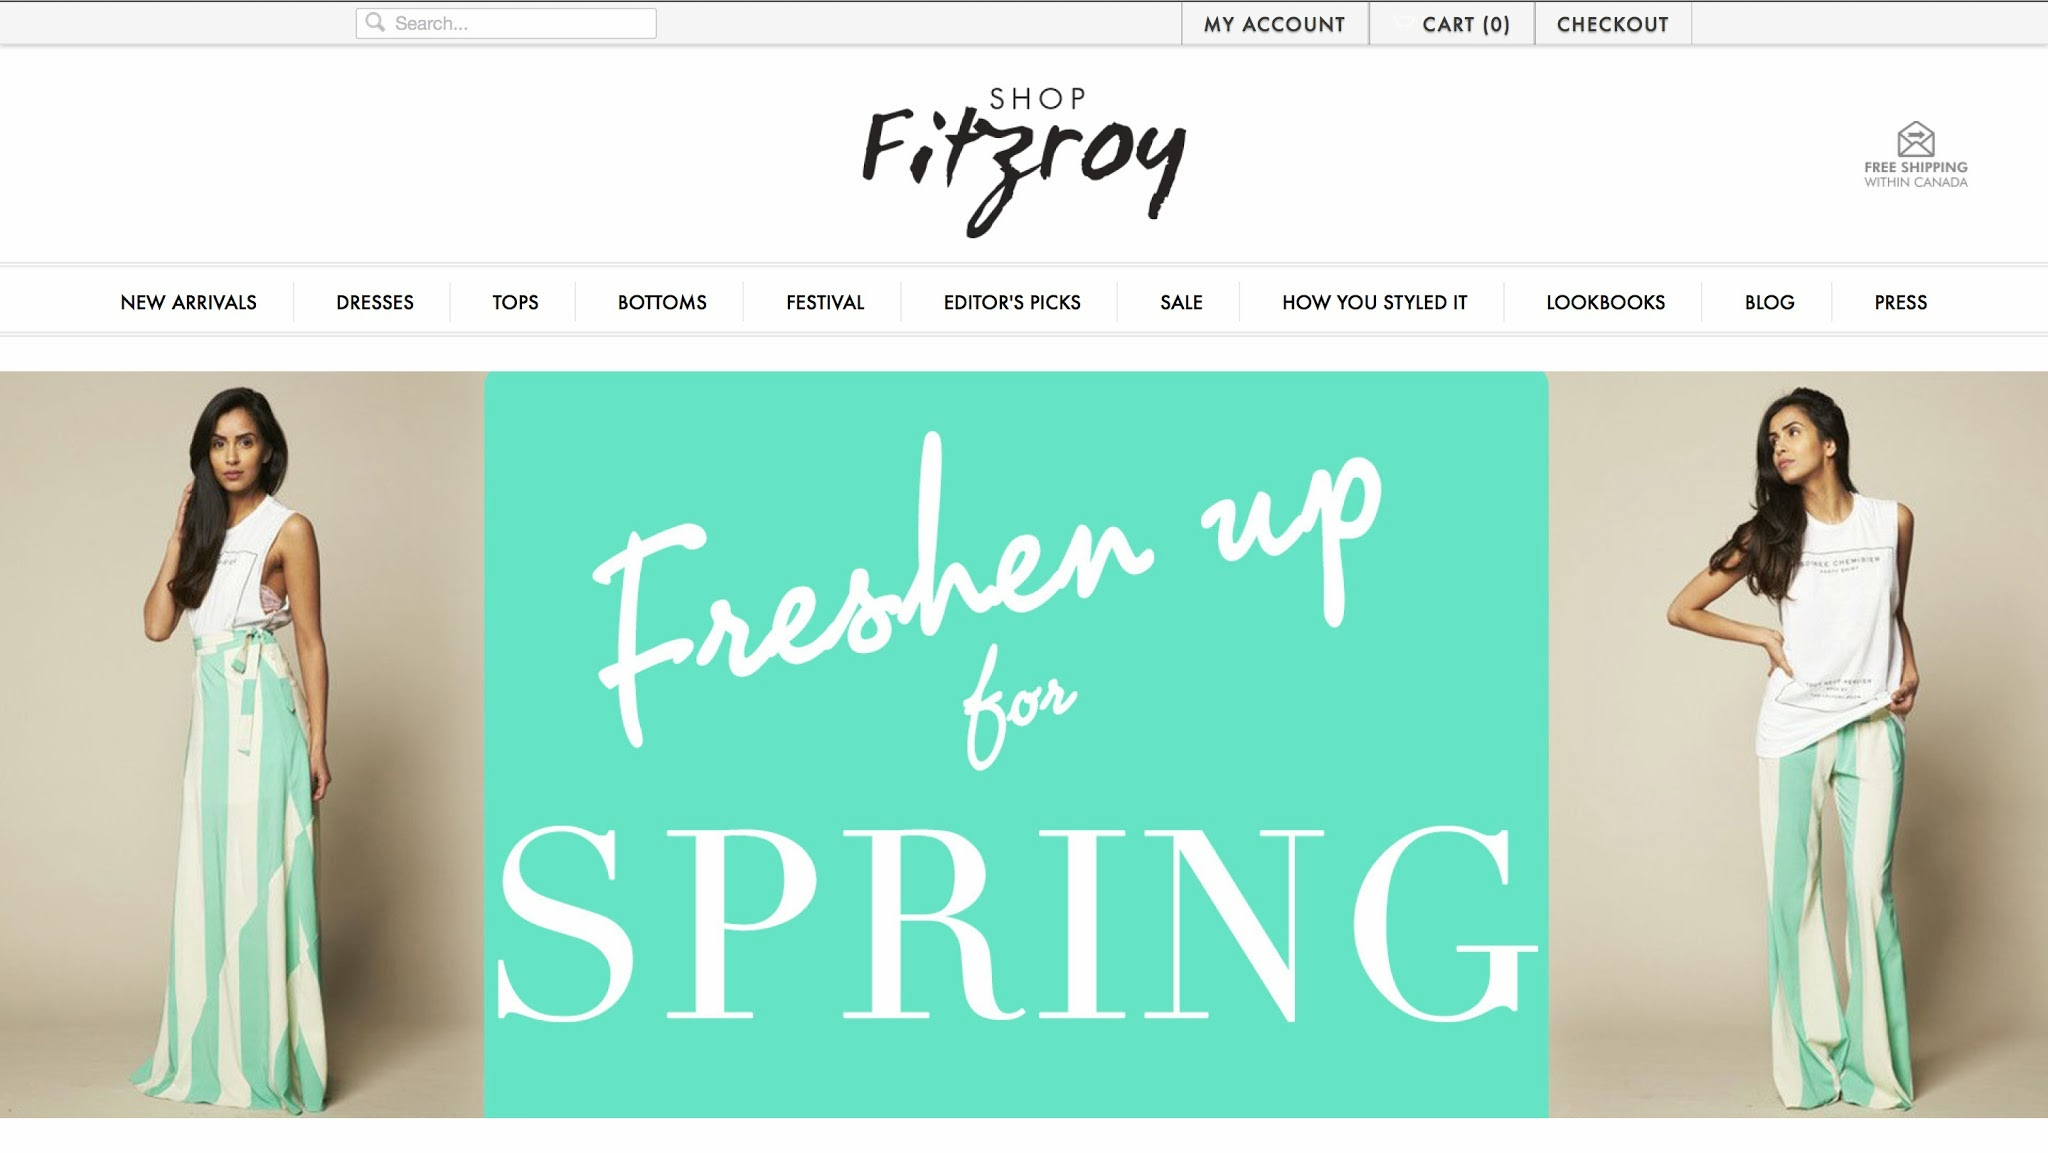 http://www.shopfitzroy.com/